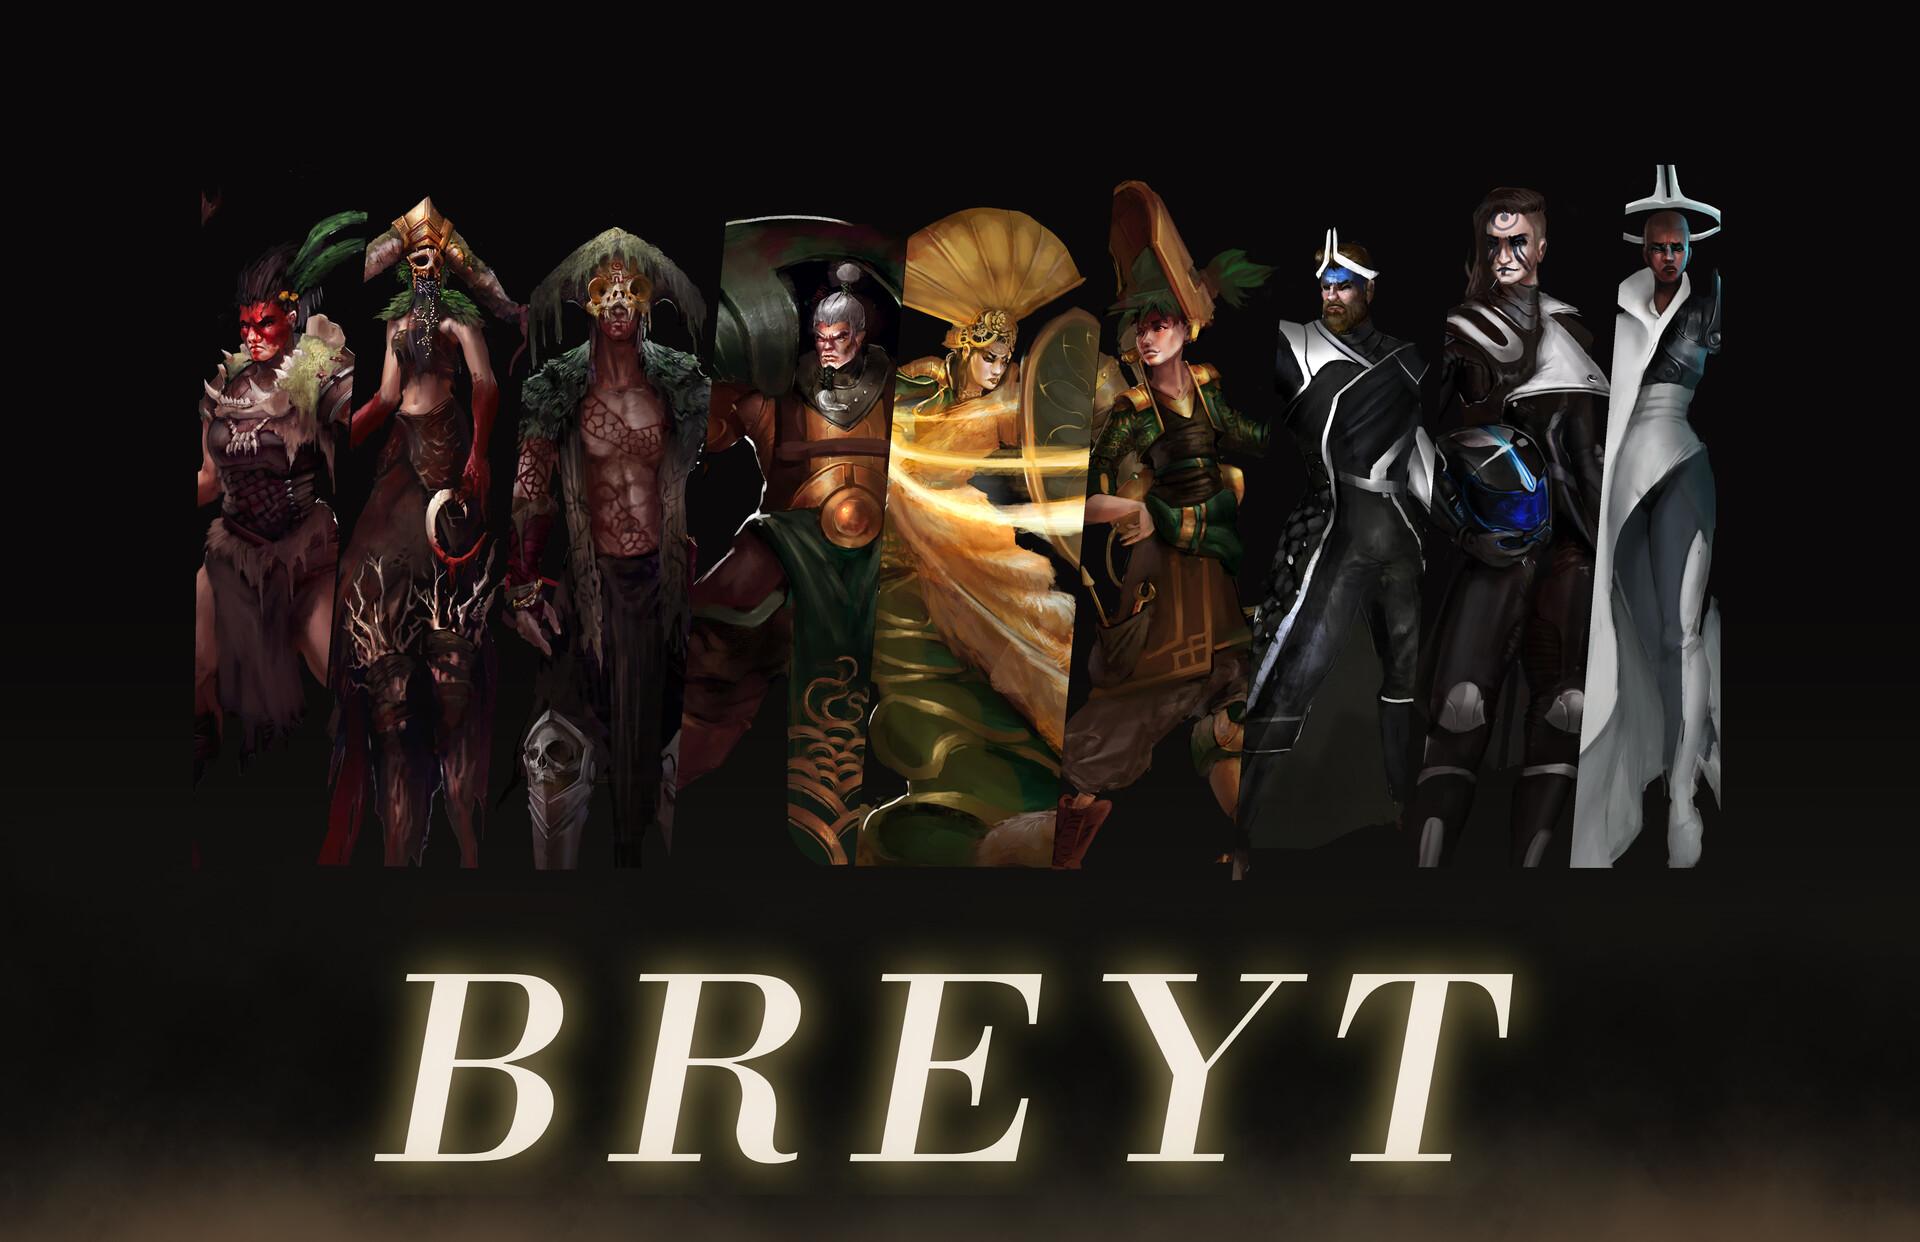 BREYT